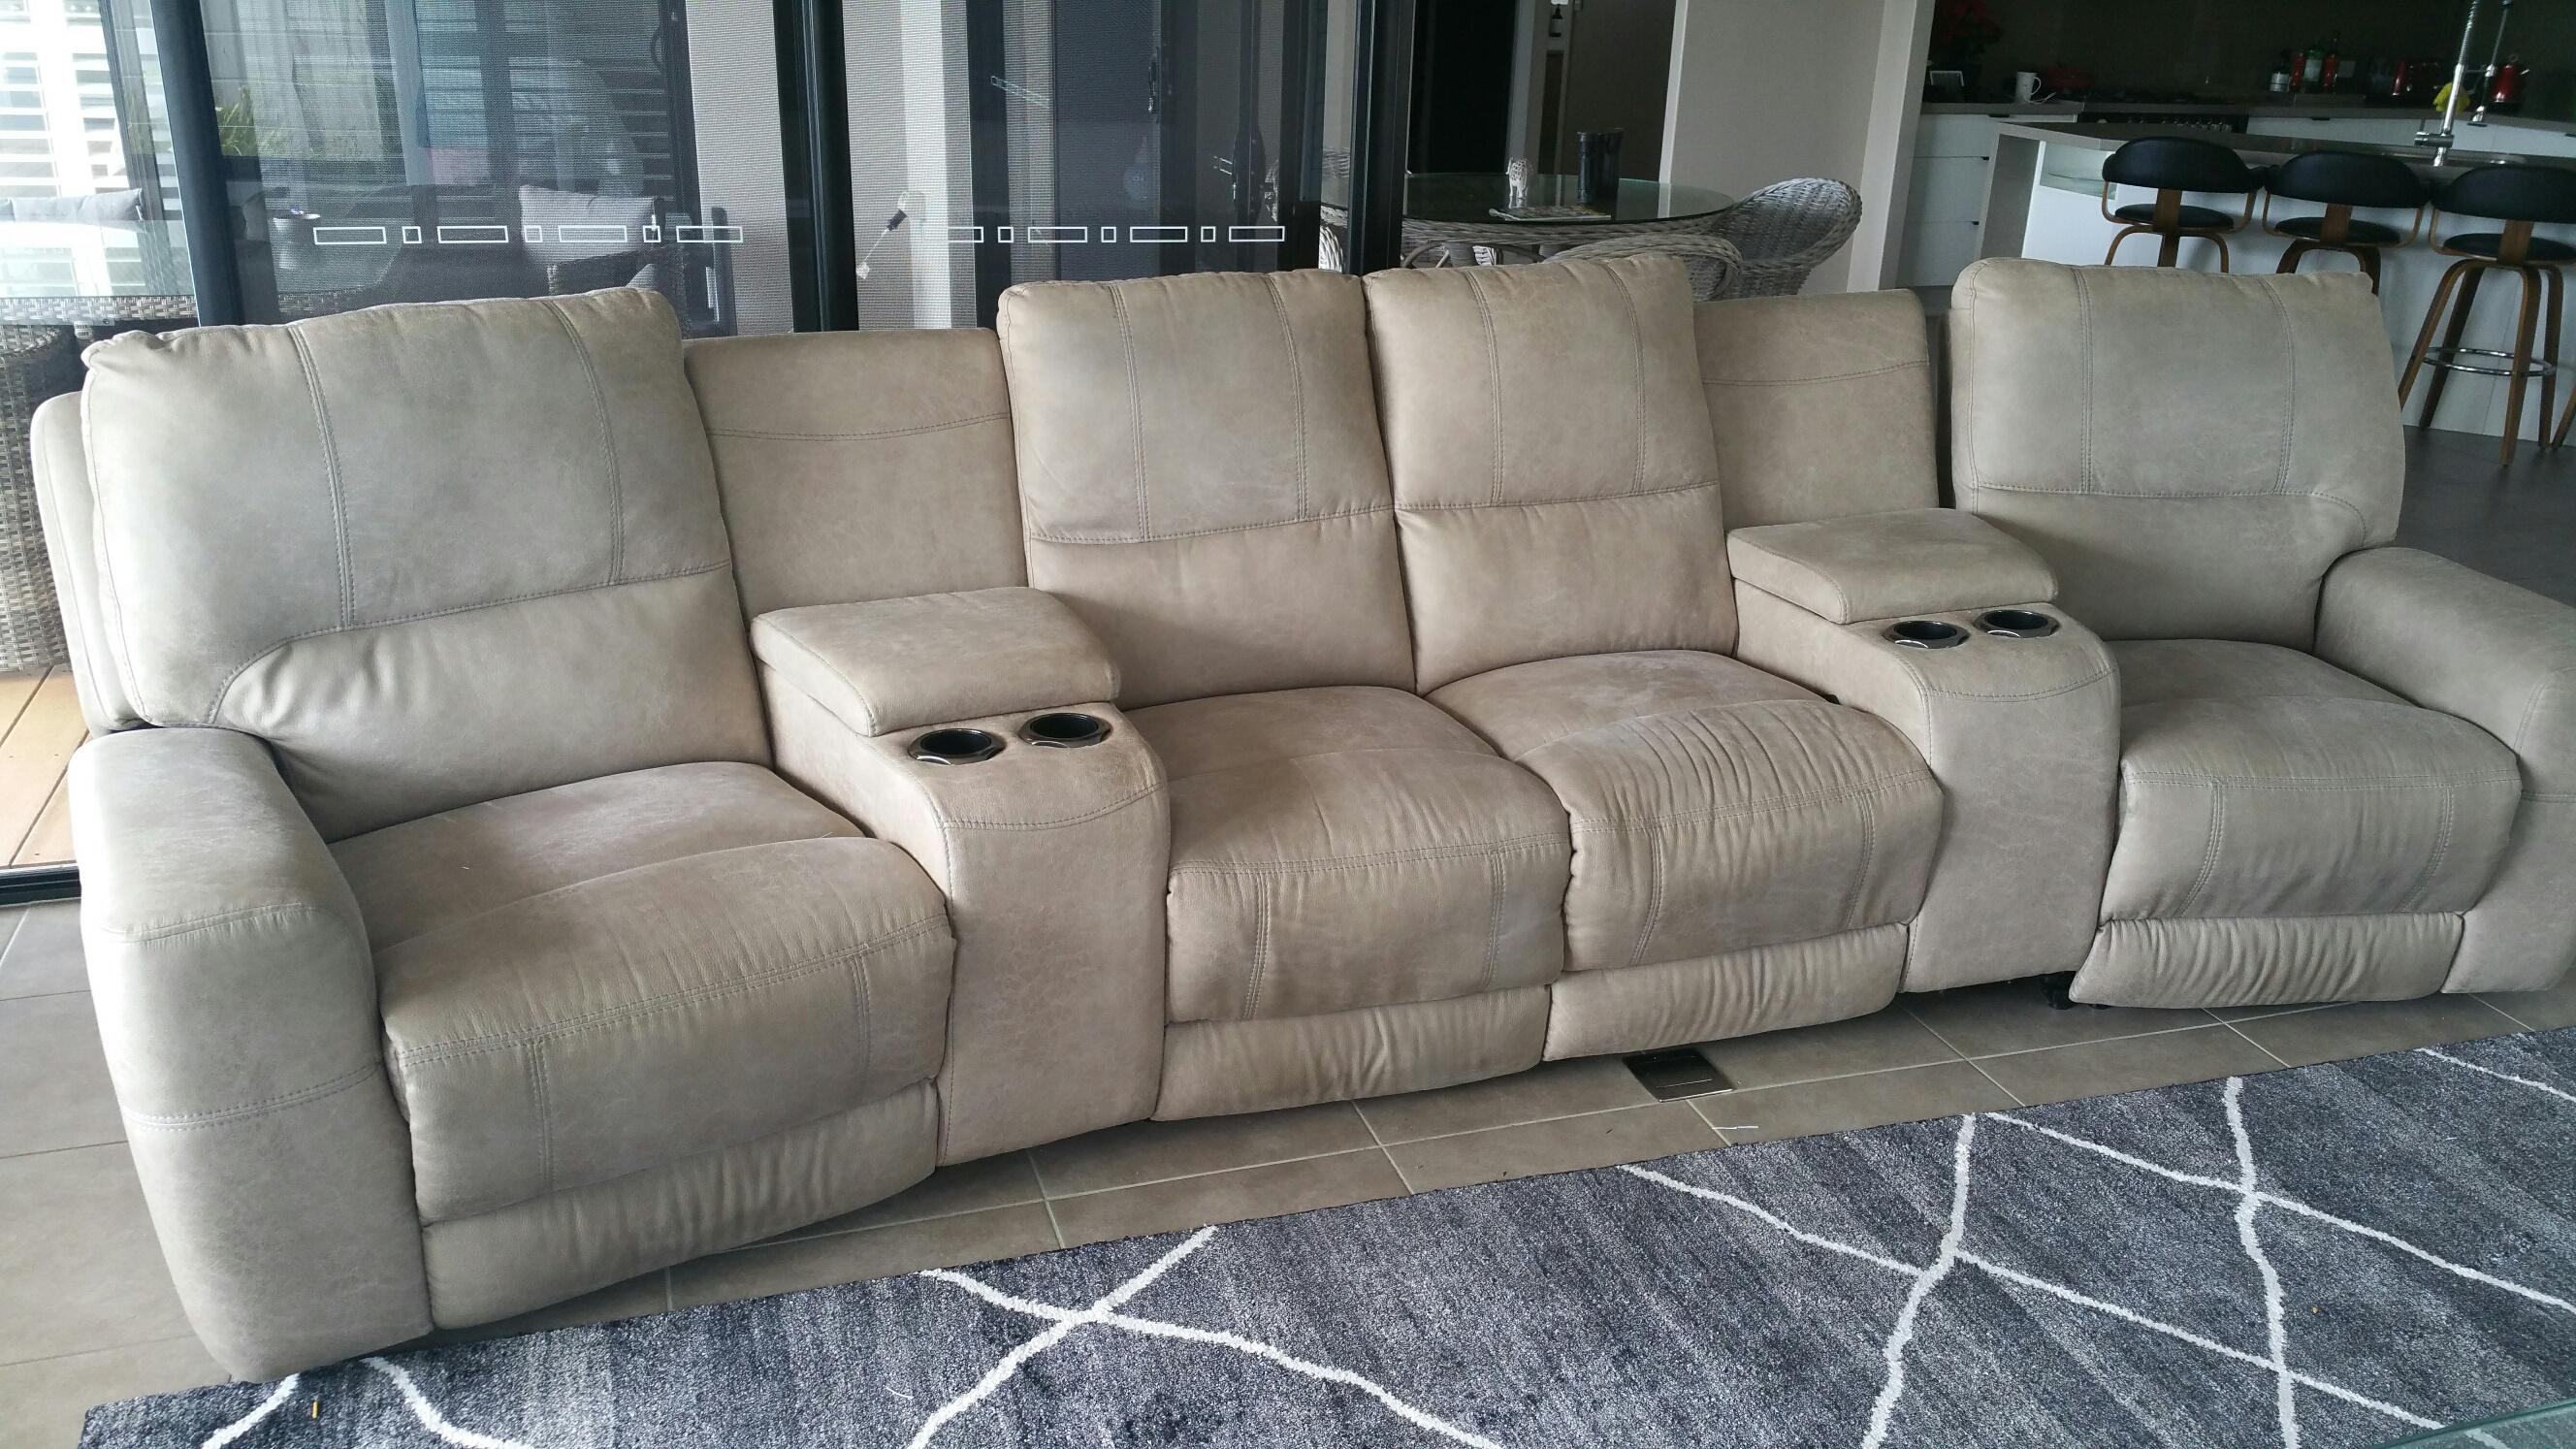 Lazy boy 4 seat lounge suite